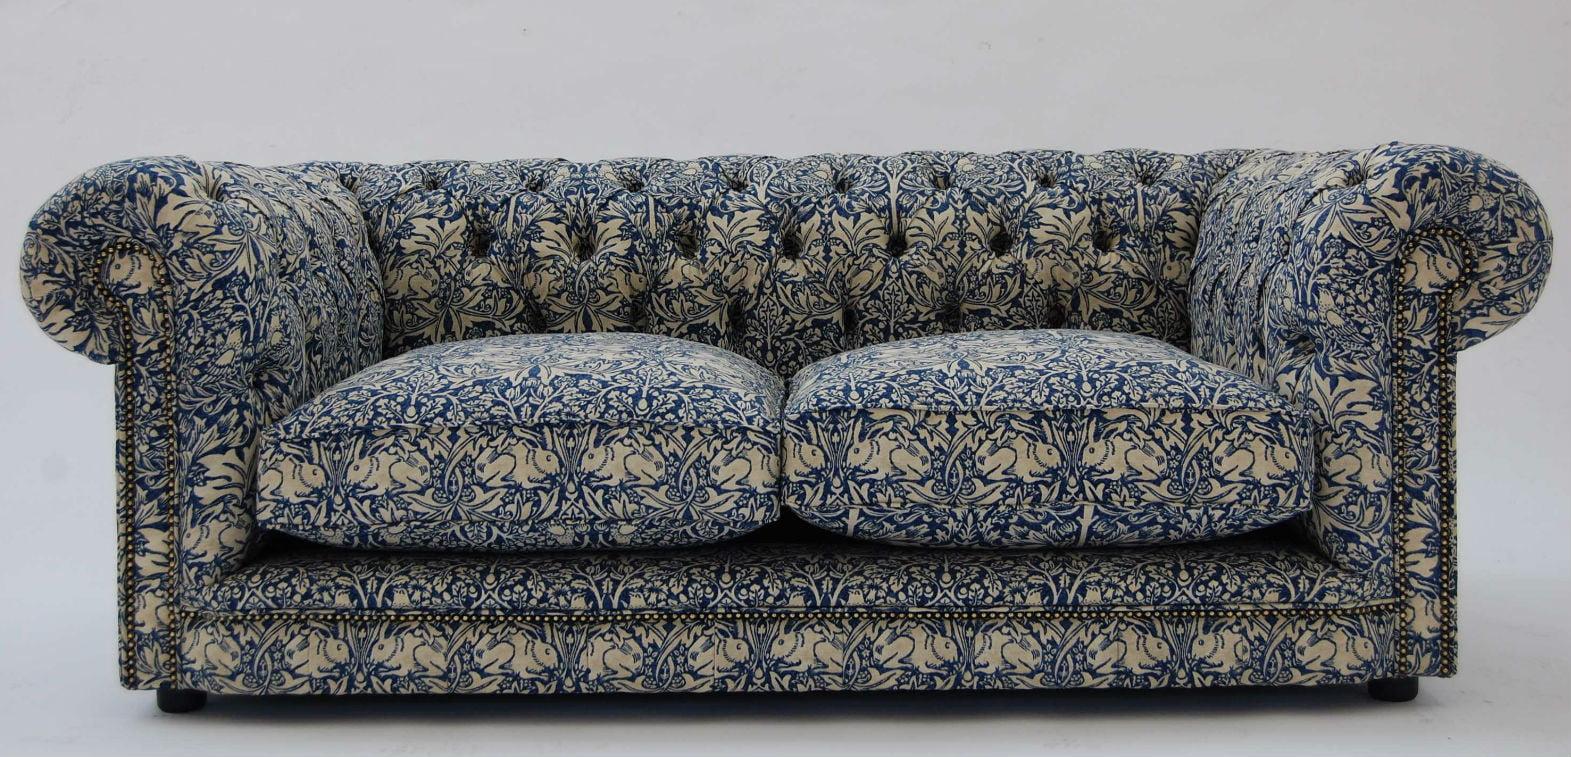 Linen chesterfield sofa